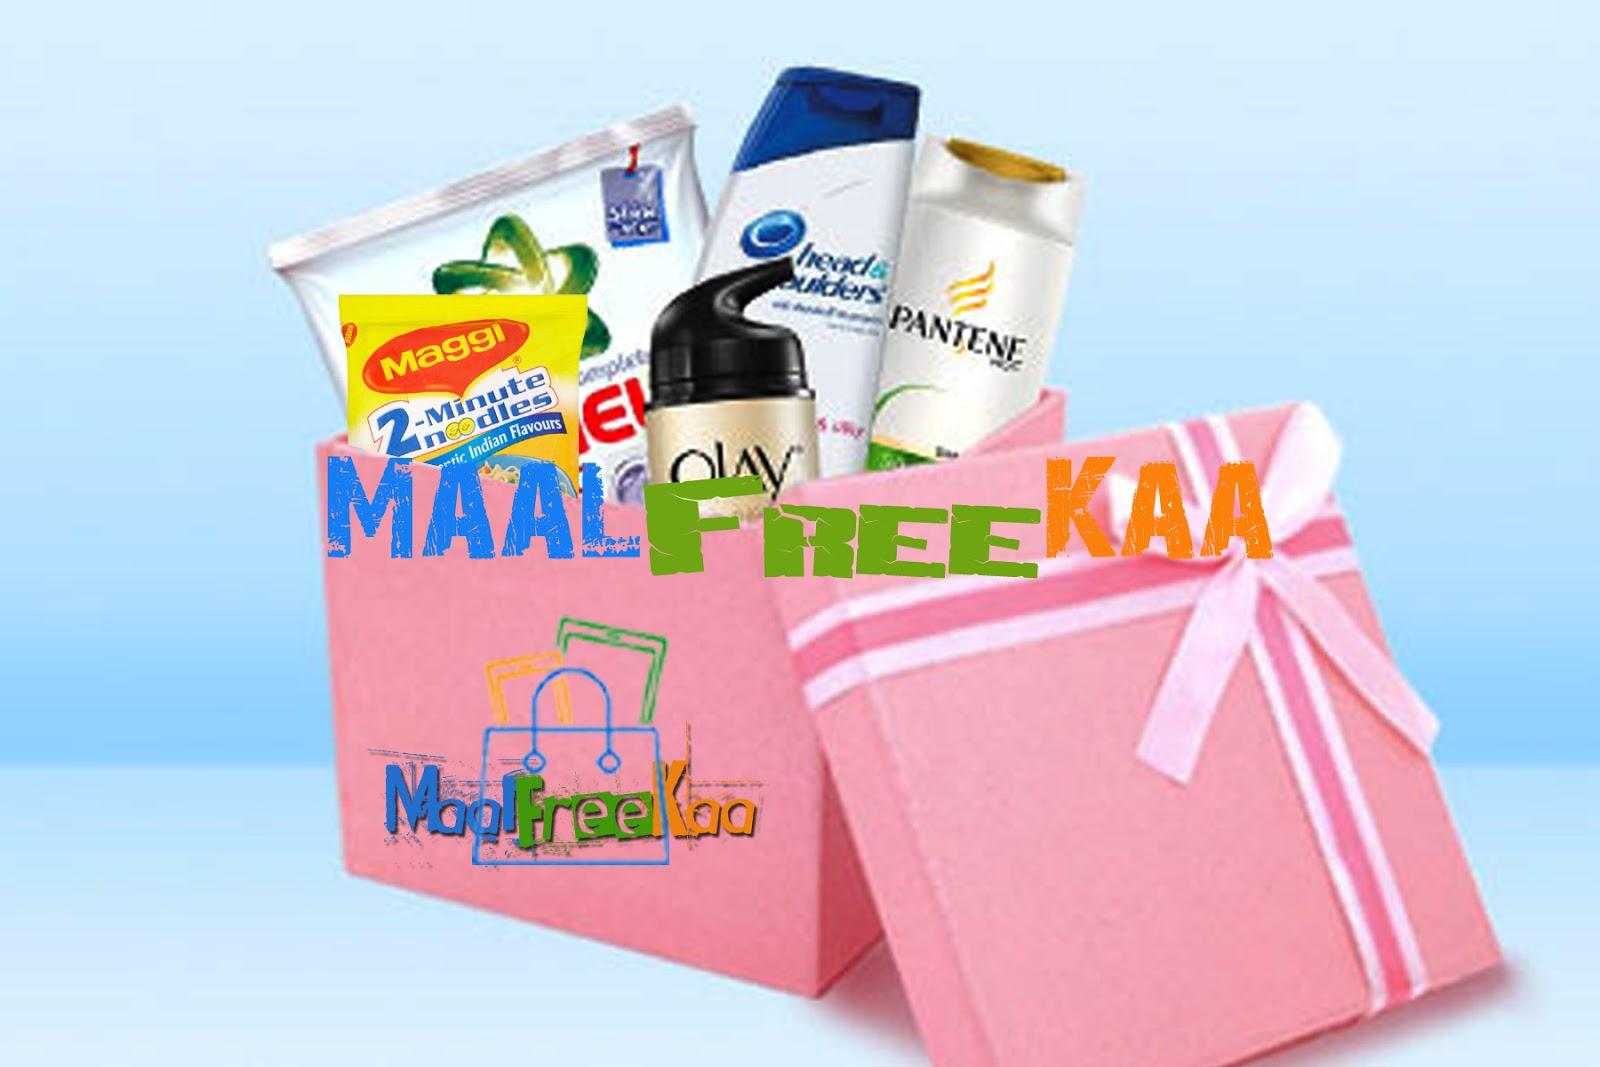 Get Free Sample Nestle Maggi And P&G Product (Ariel, Pantene